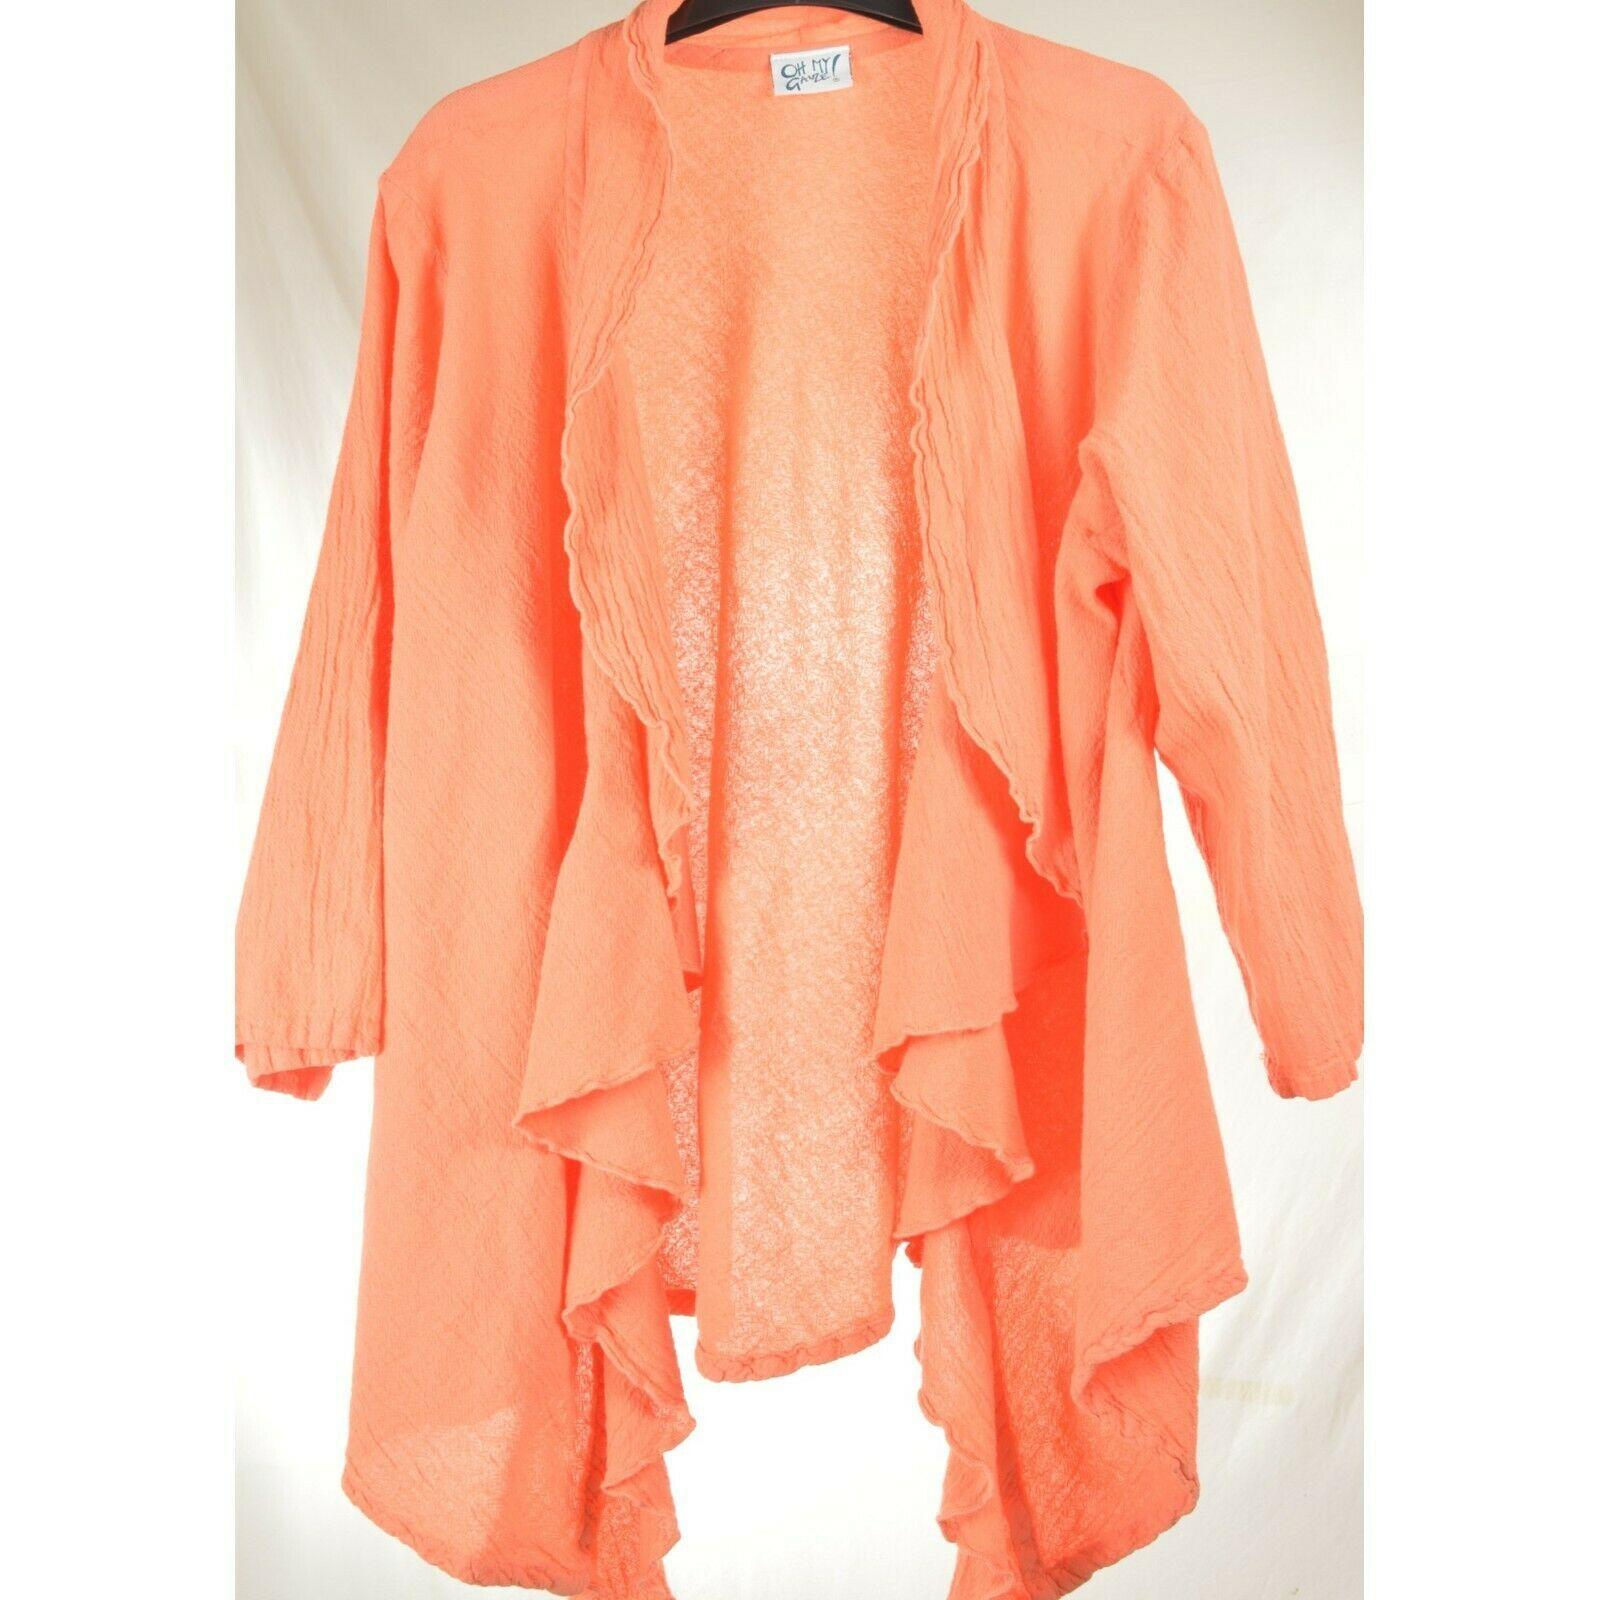 Oh My Gauge jacket cover open OS orange sherbet long sleeve ruffle front hi lo image 4